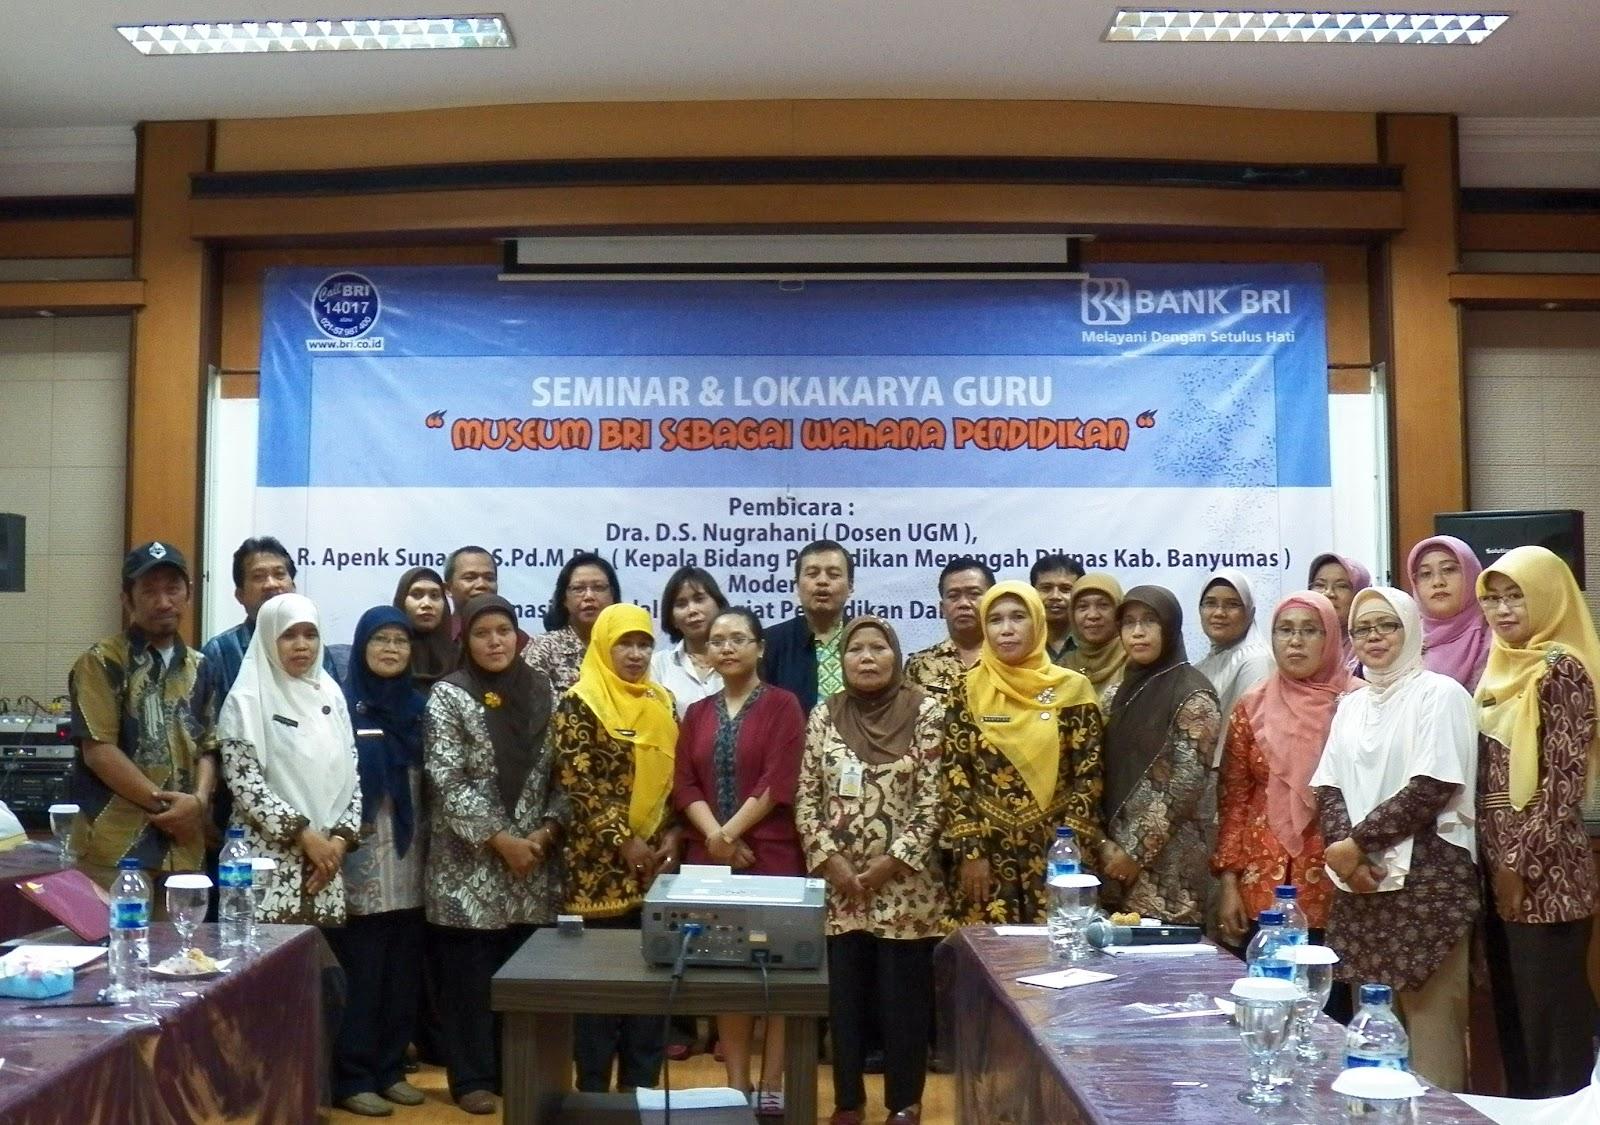 Museum Bank Rakyat Indonesia Bri Mei 2012 Kab Banyumas